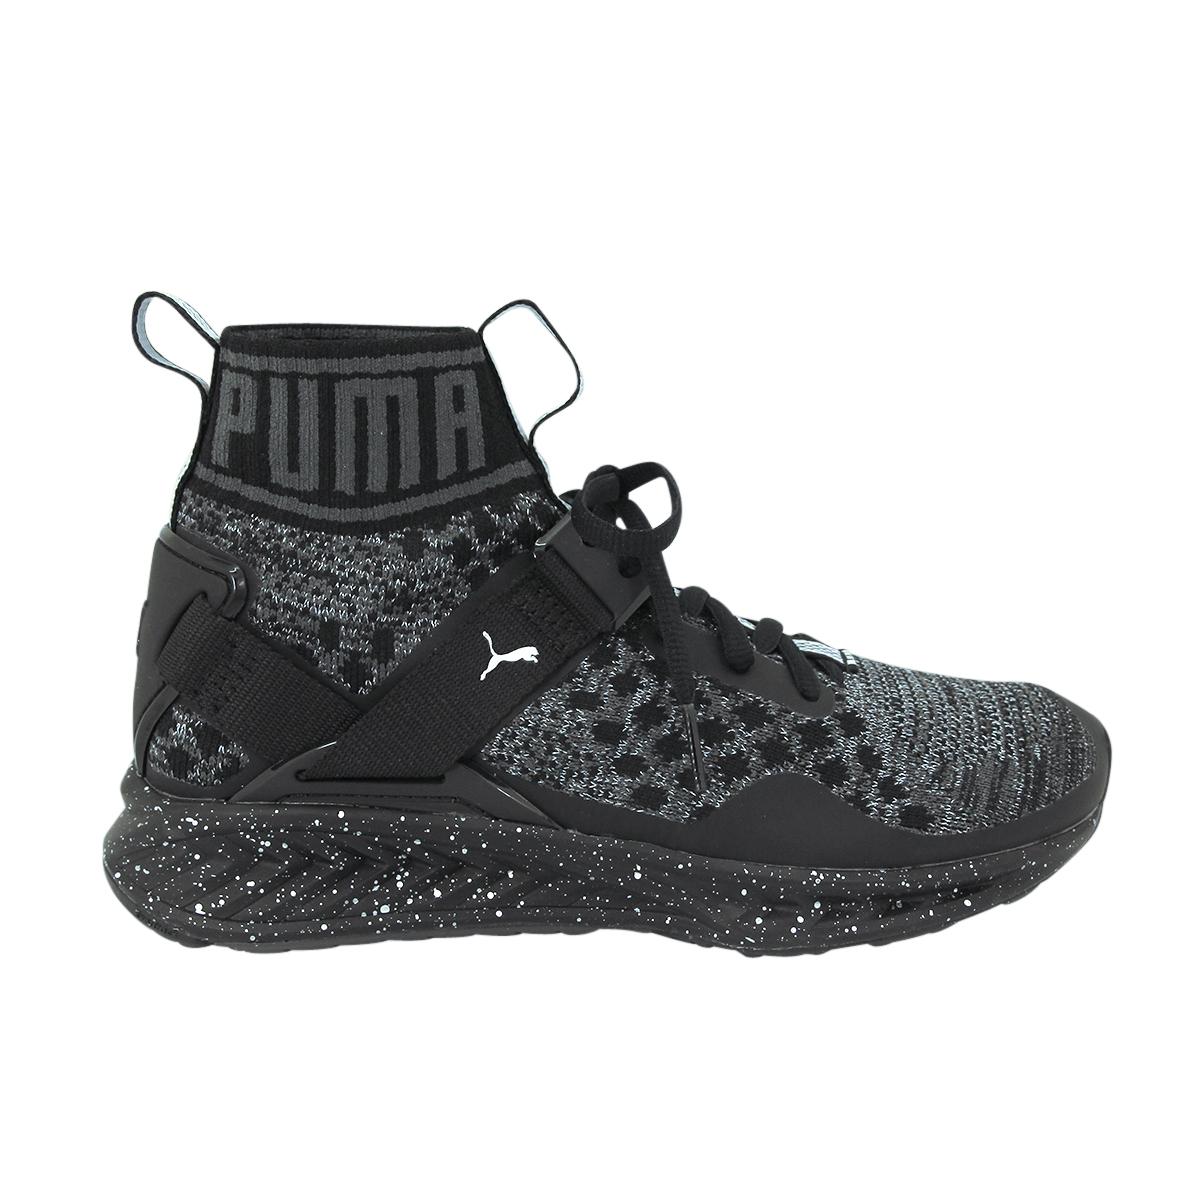 20aed4920c97cf Evertrack Sneakers Puma Ignite Herren Schuhe Evoknit IqgPwHT